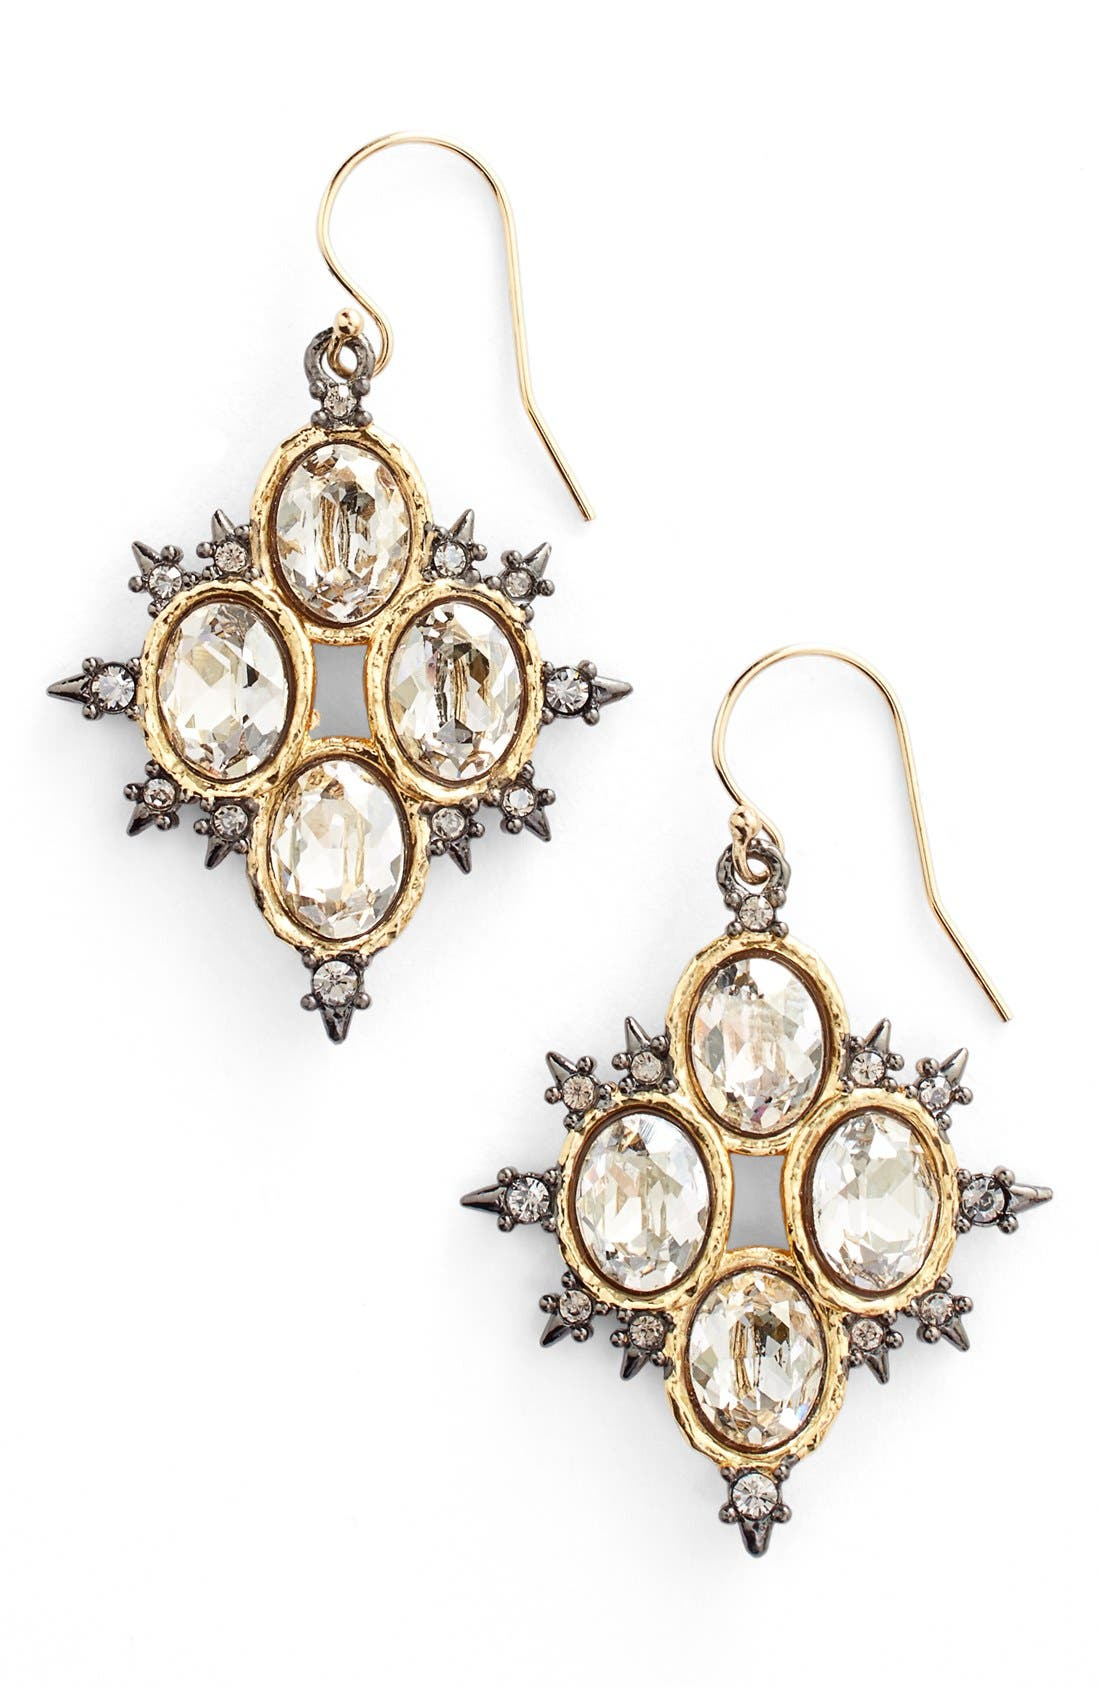 Main Image - Alexis Bittar 'Elements' Crystal Drop Earrings